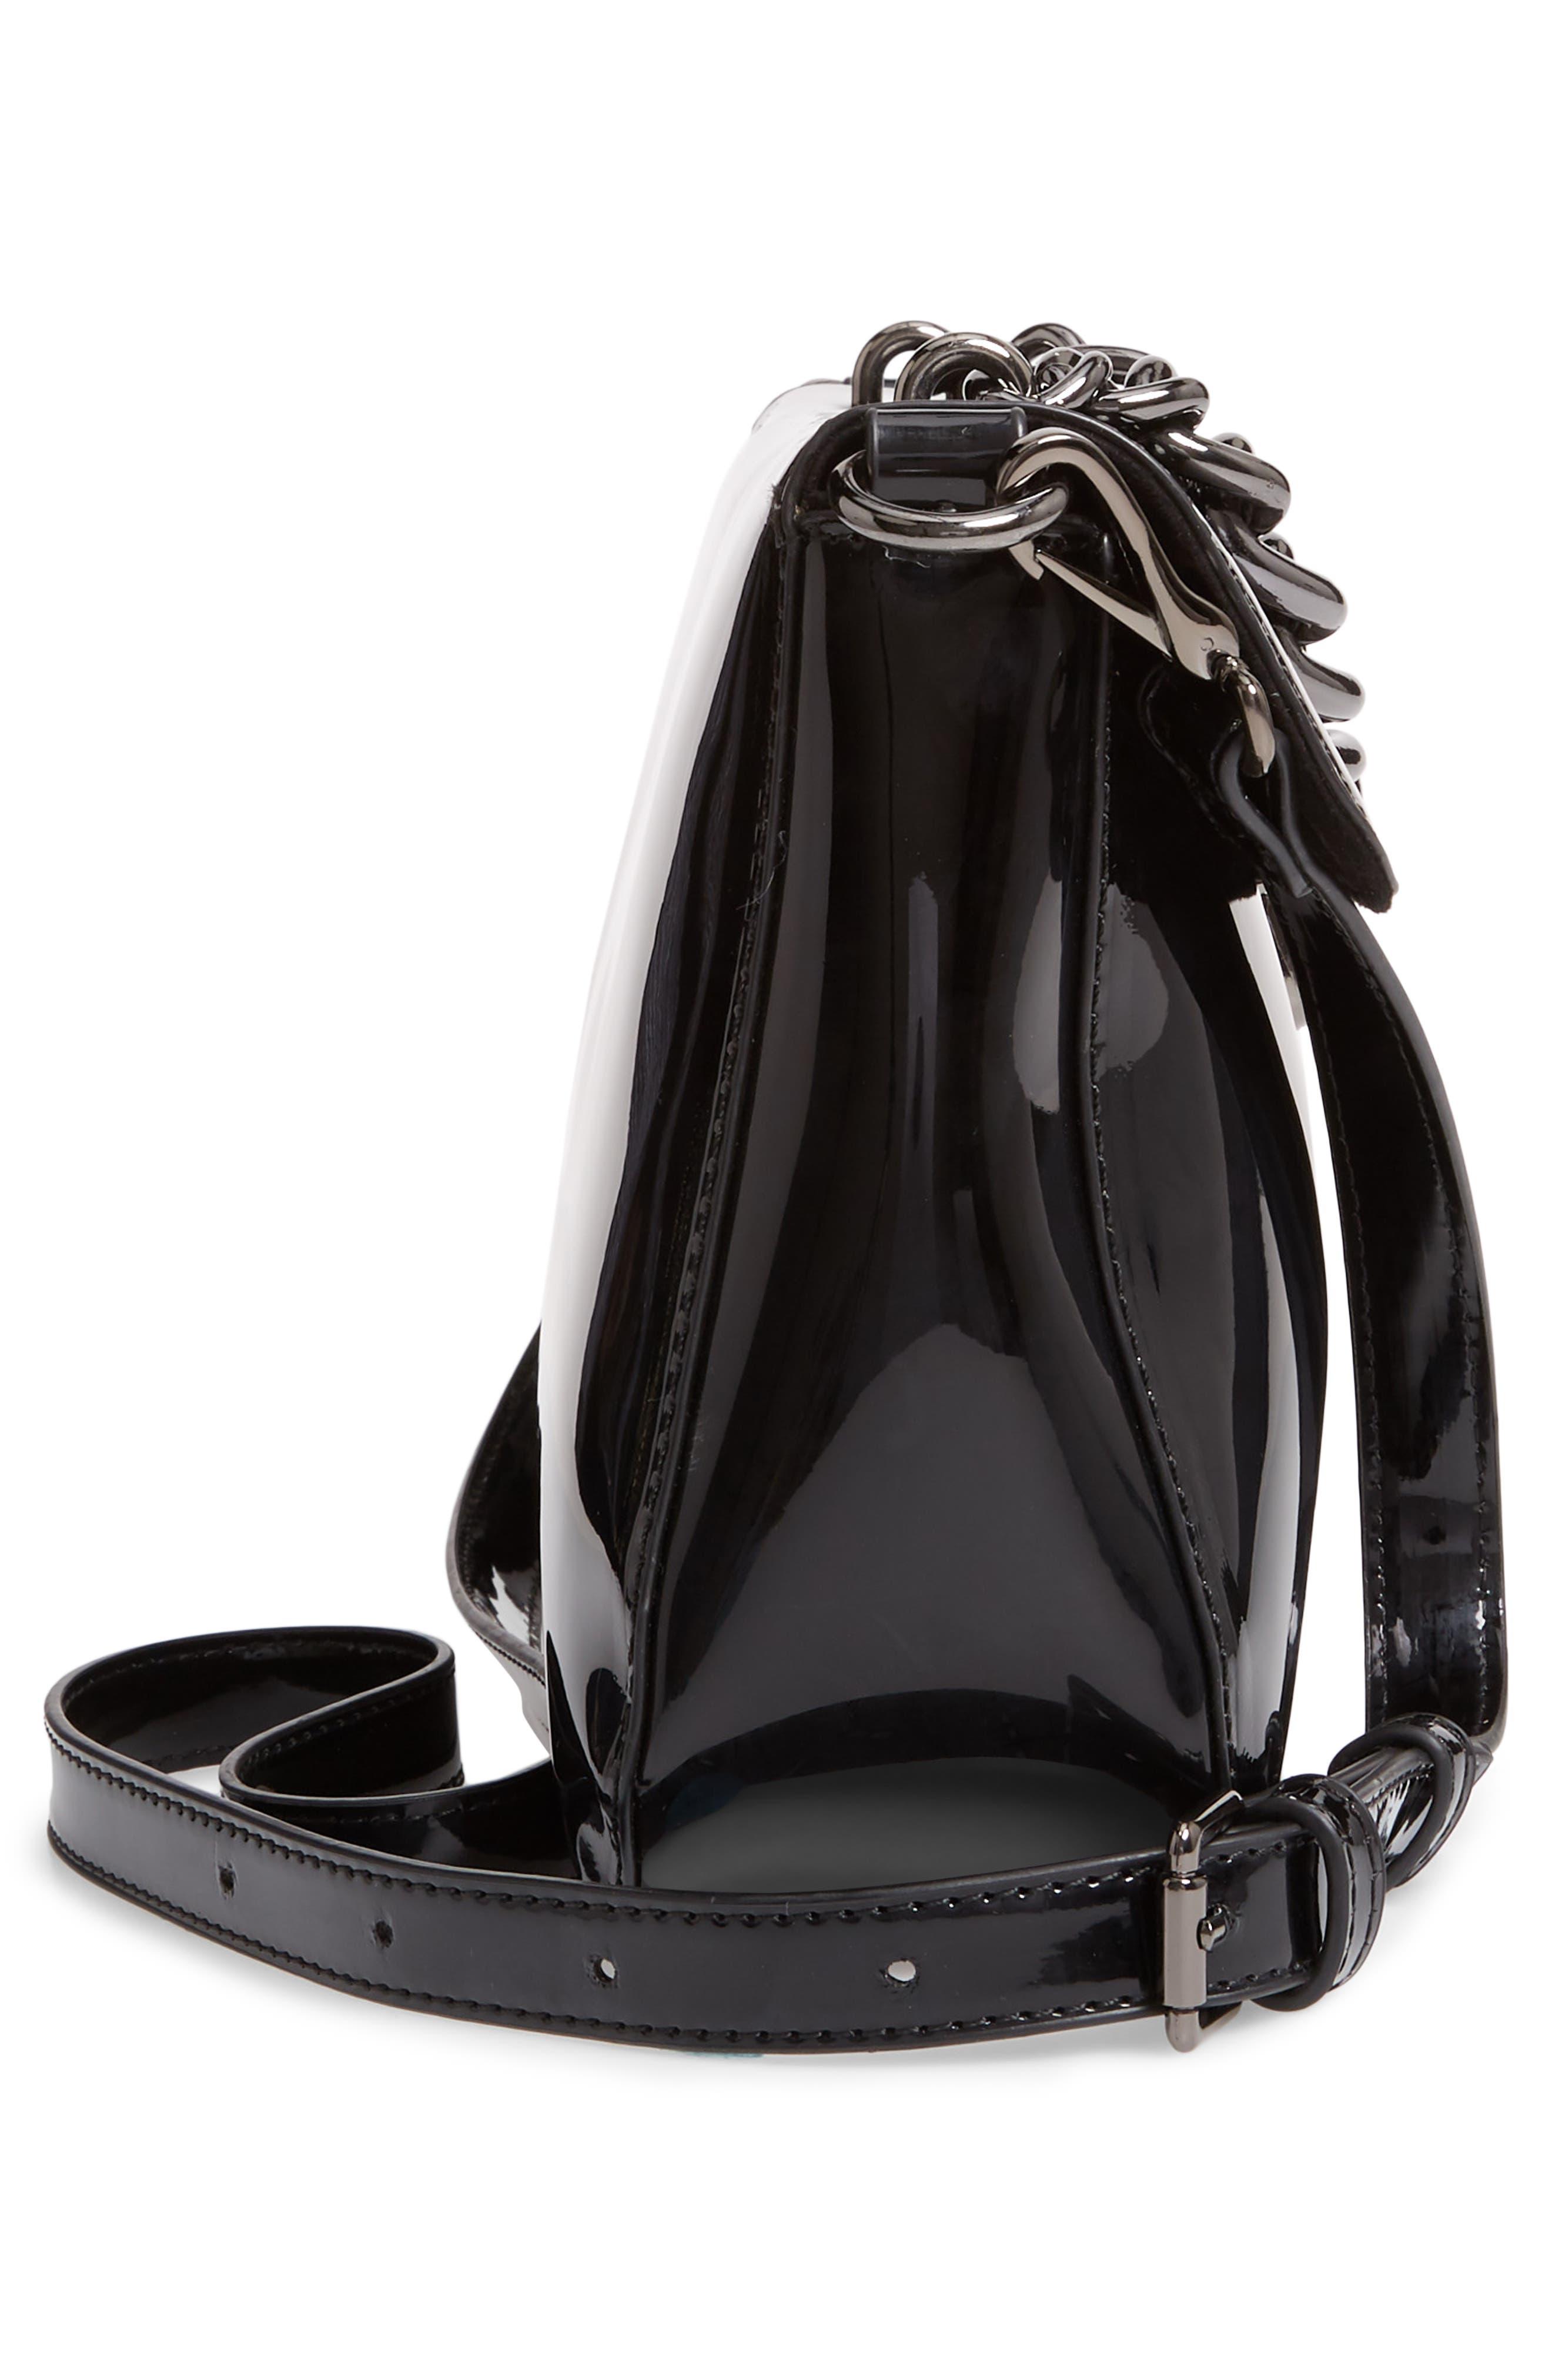 SOLE SOCIETY, Ladan Faux Leather Top Handle Satchel, Alternate thumbnail 5, color, 001